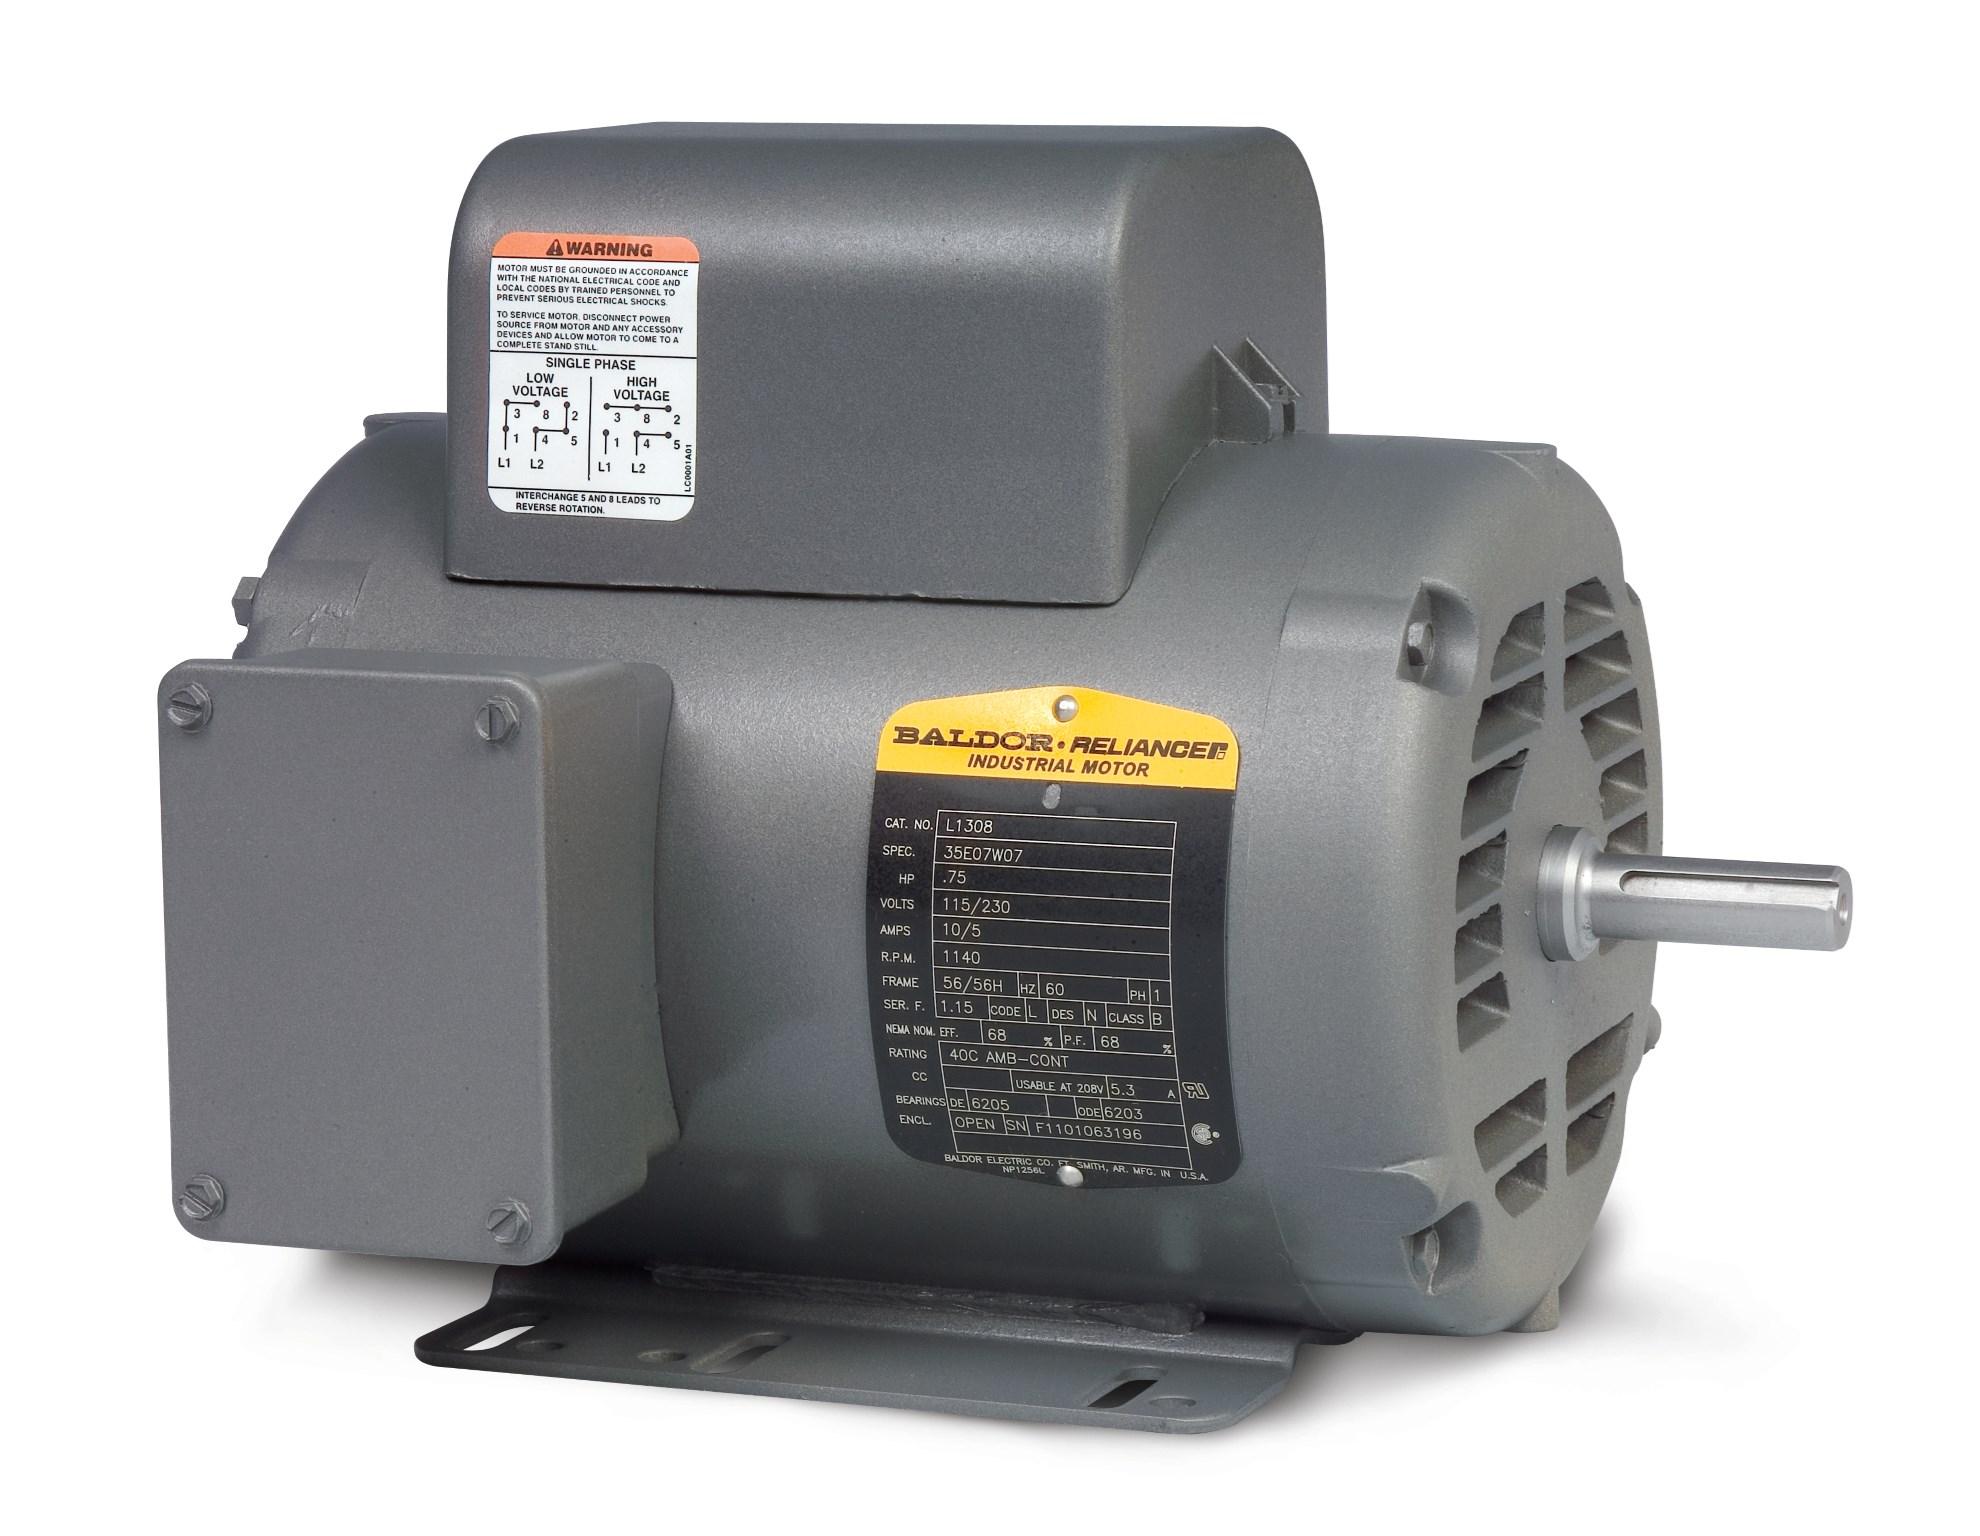 250?bcdwhite6asd16hd2566wd256 baldor 10 hp electric motor wiring diagram efcaviation com baldor l1430t wiring diagram at panicattacktreatment.co